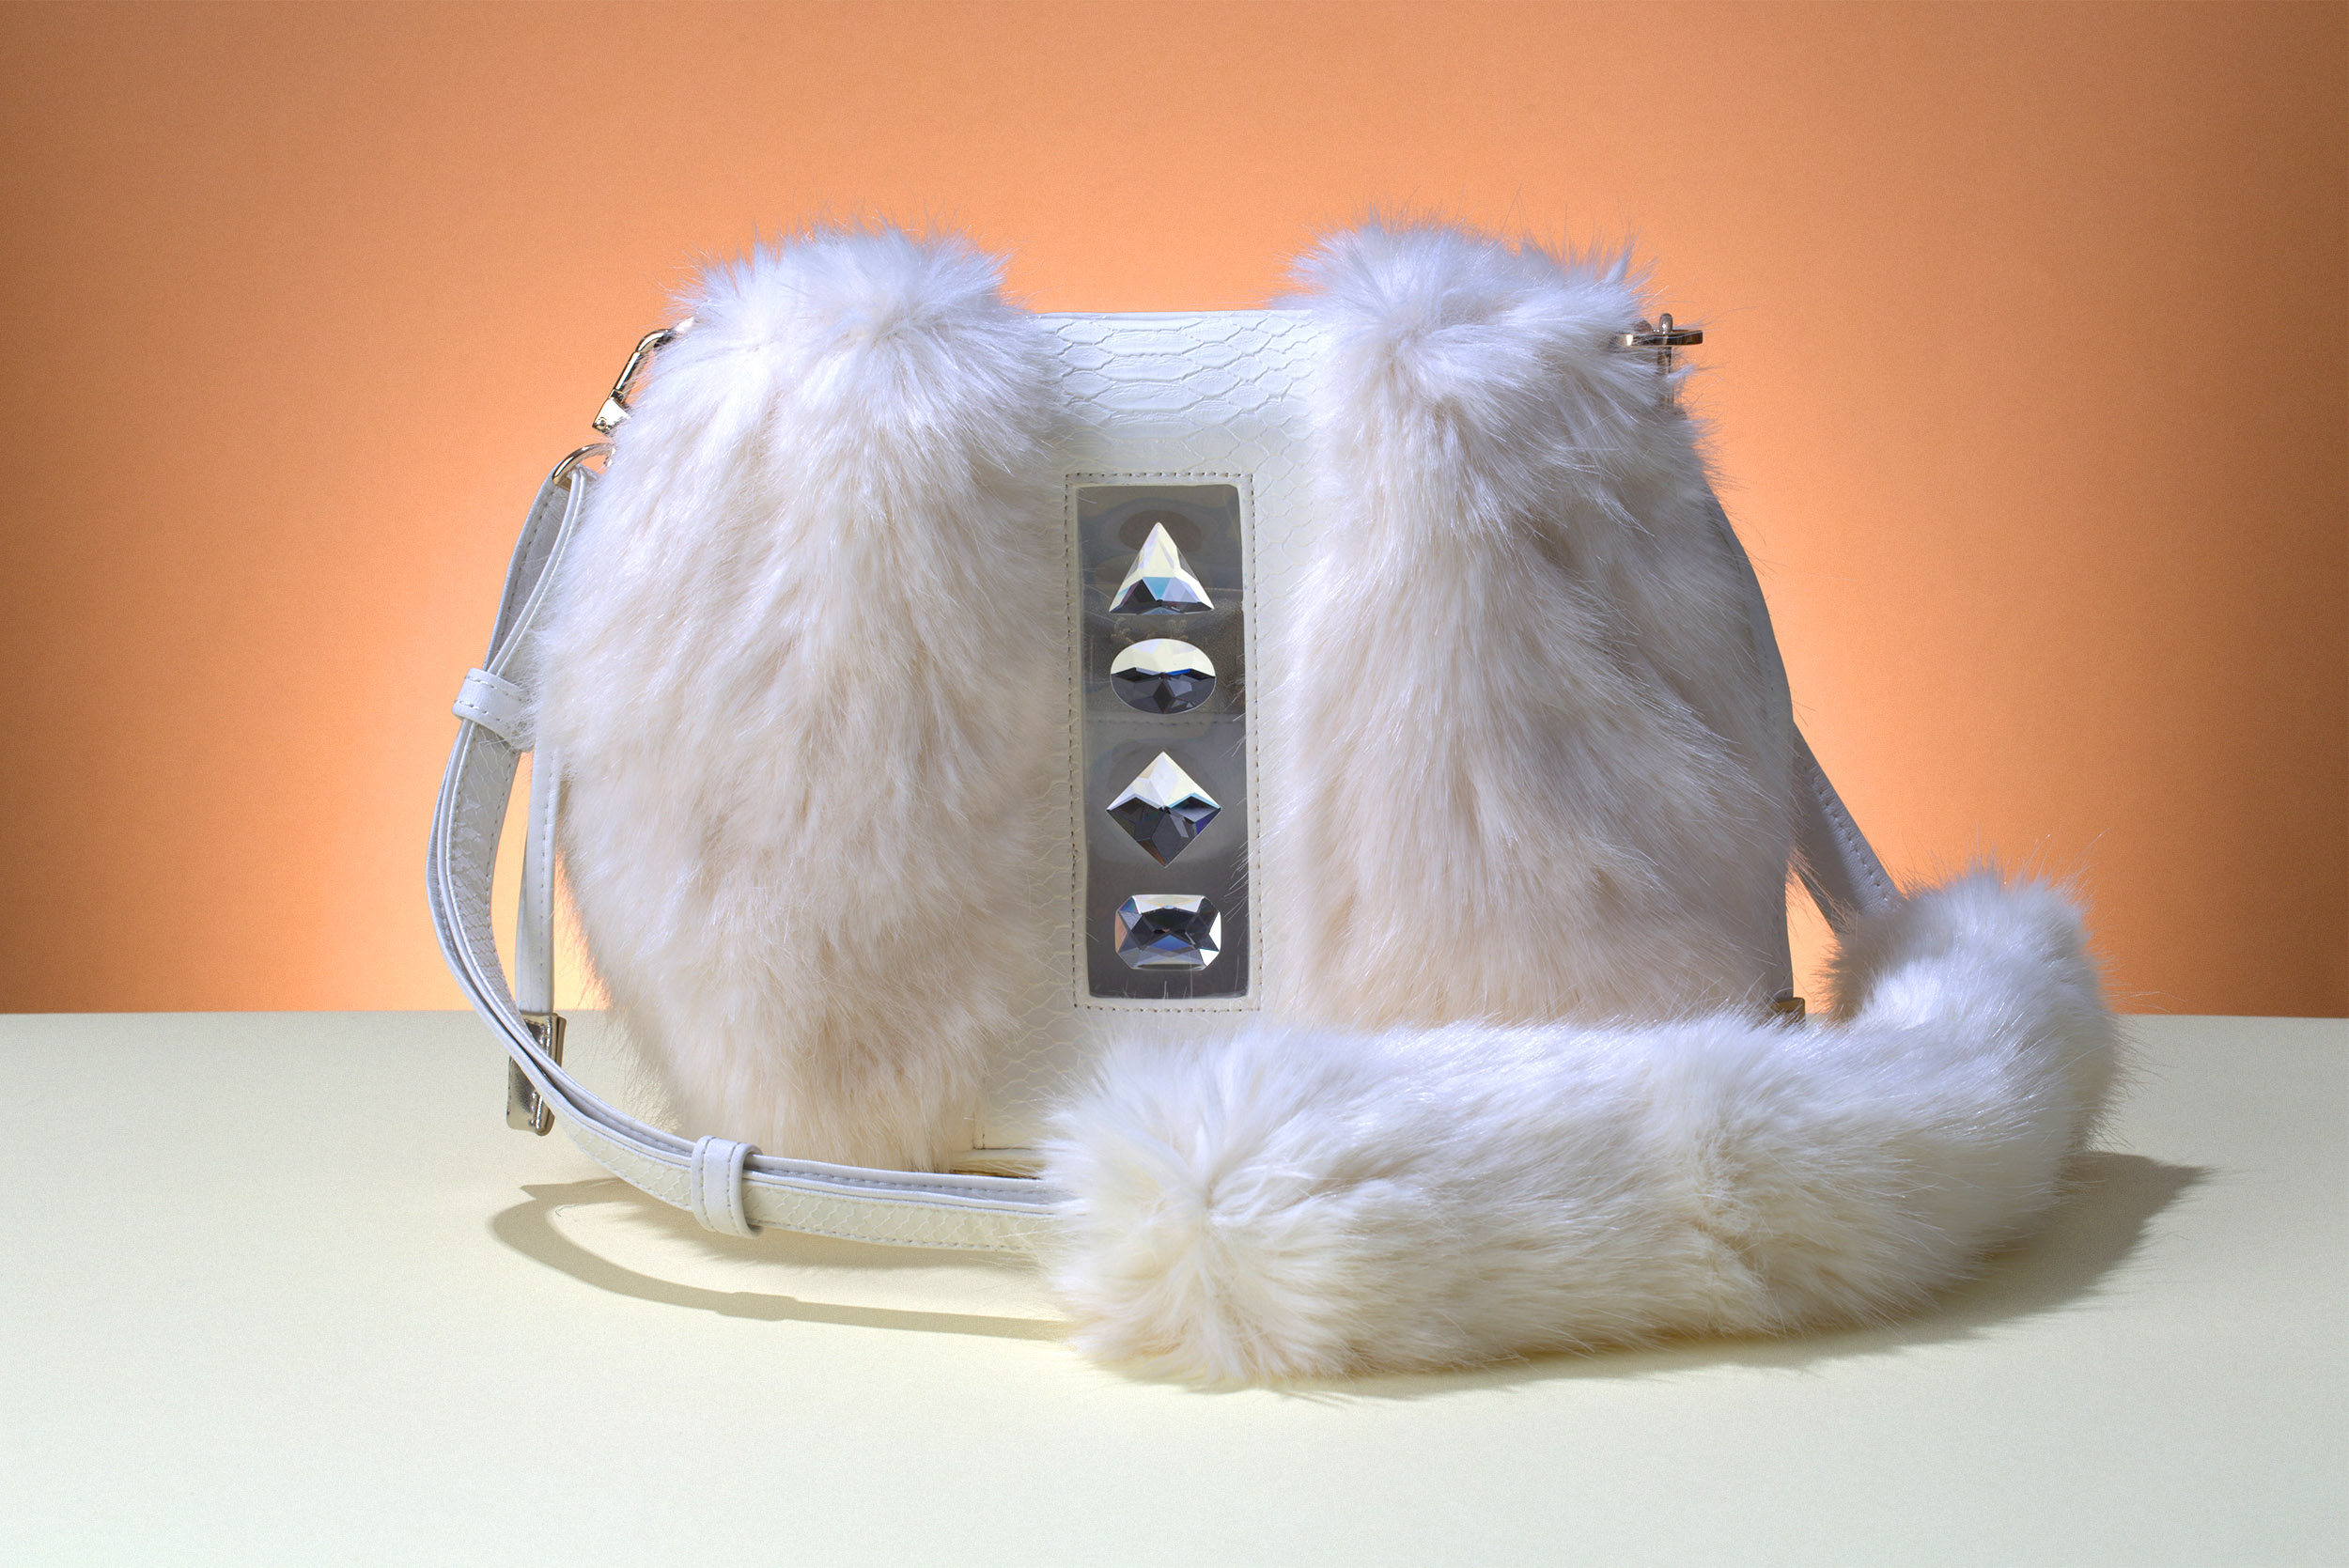 FruitenVeg-NAMI bag-never-fur-vegan-fake-faux-fur-cross-body-white-rhinestones-small-luxury-handbag-nyc